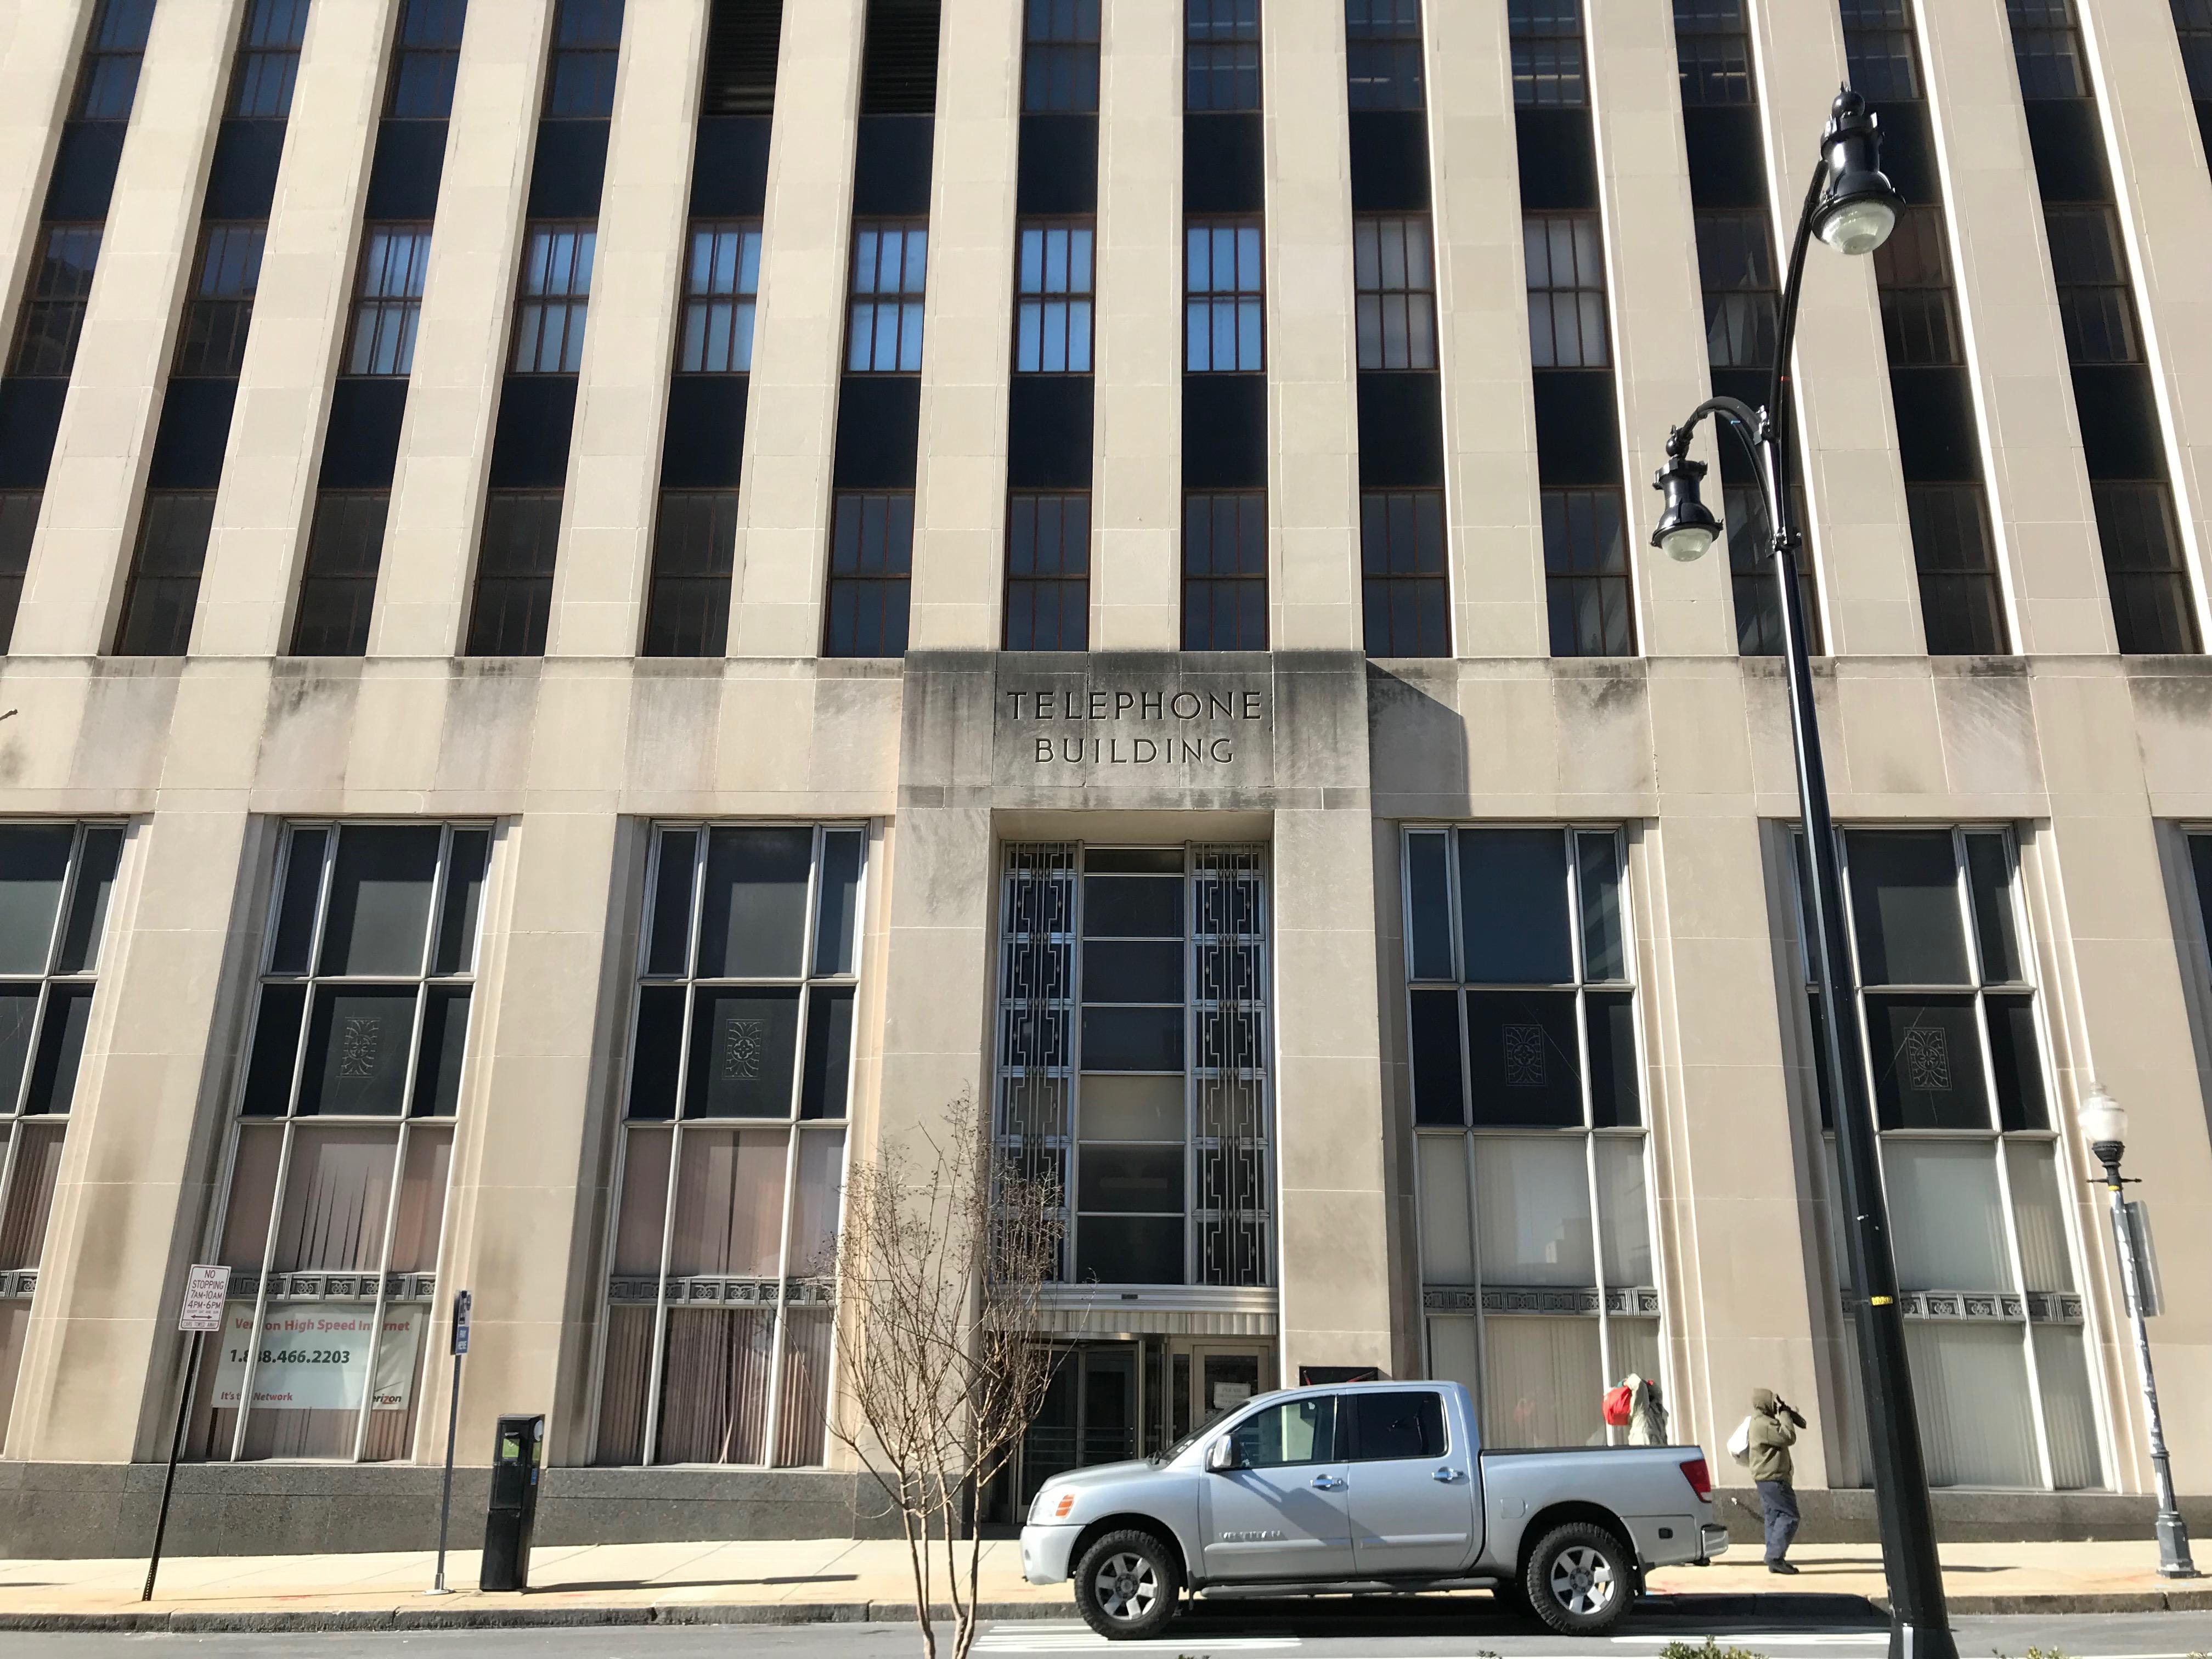 Bell atlantic telephone building/verizon offices, 330 saint paul street, baltimore, md 21201 photo